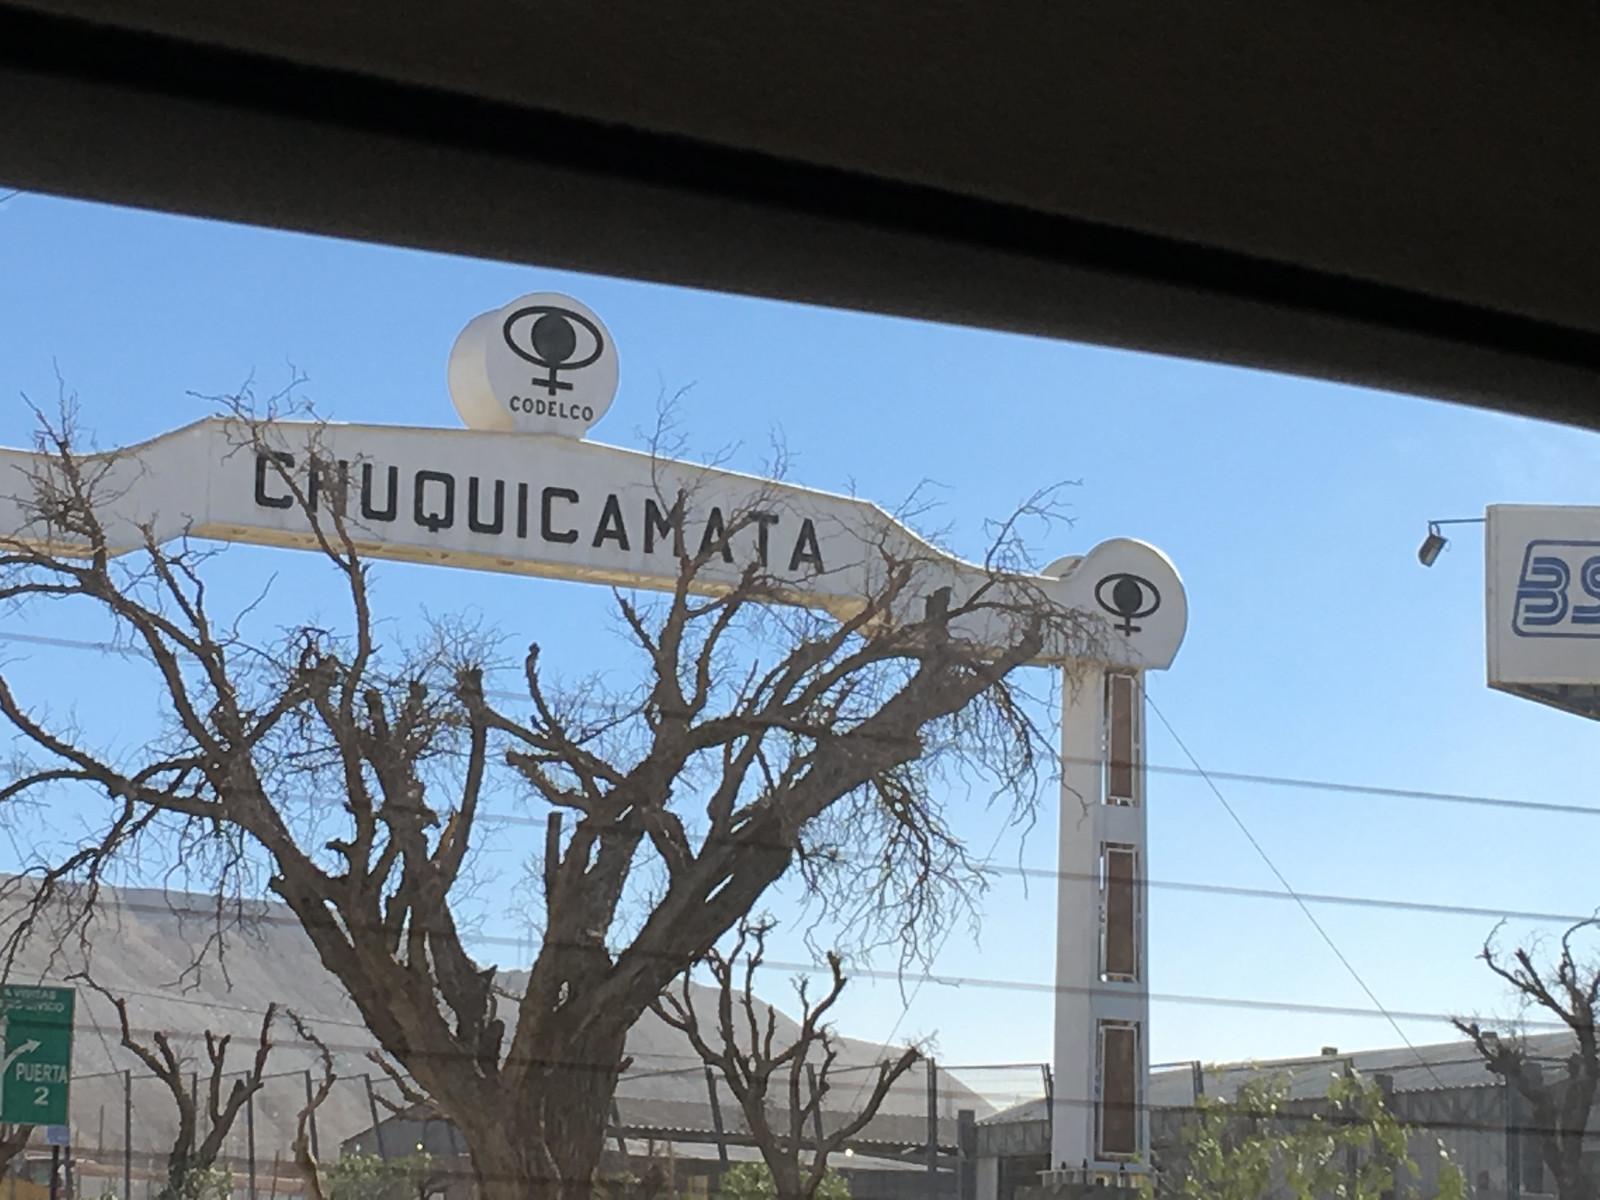 Chuquicamata sign